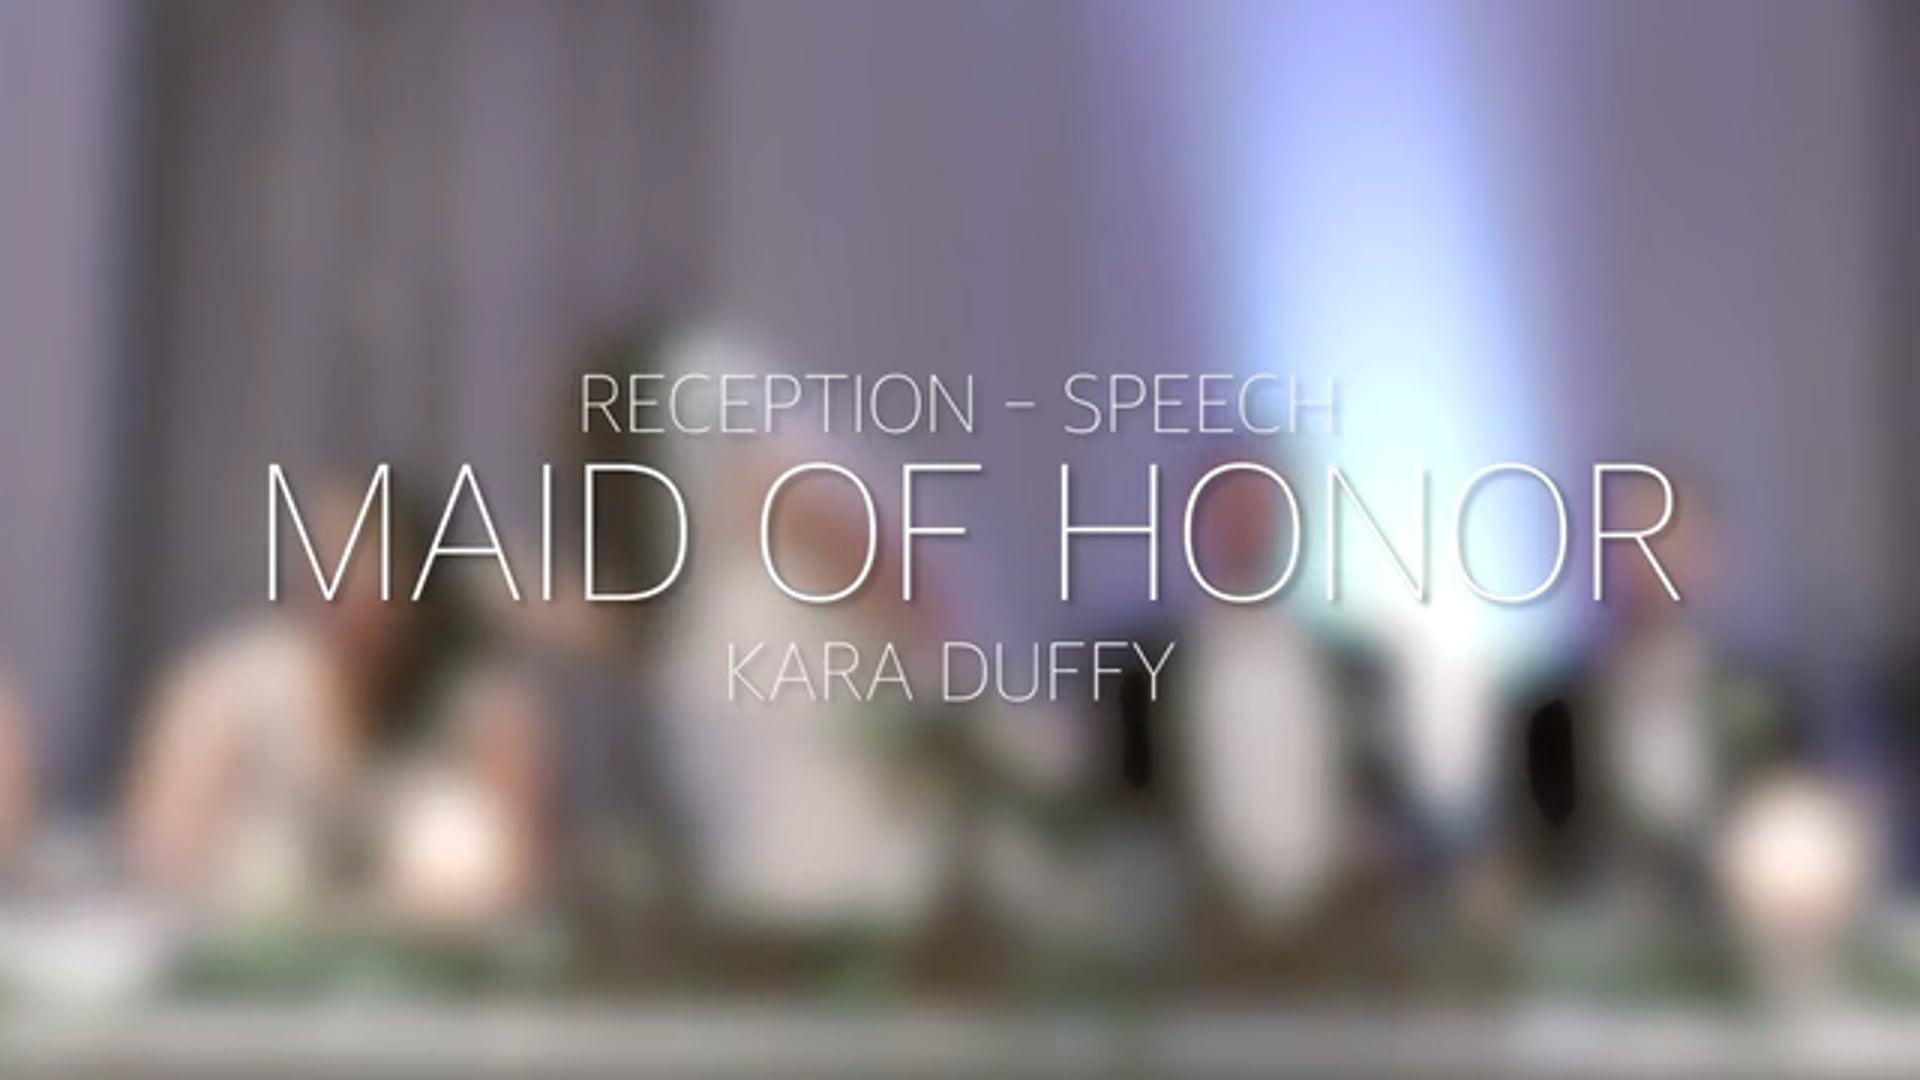 Doyle Wedding Reception - Maid of Honor Speech